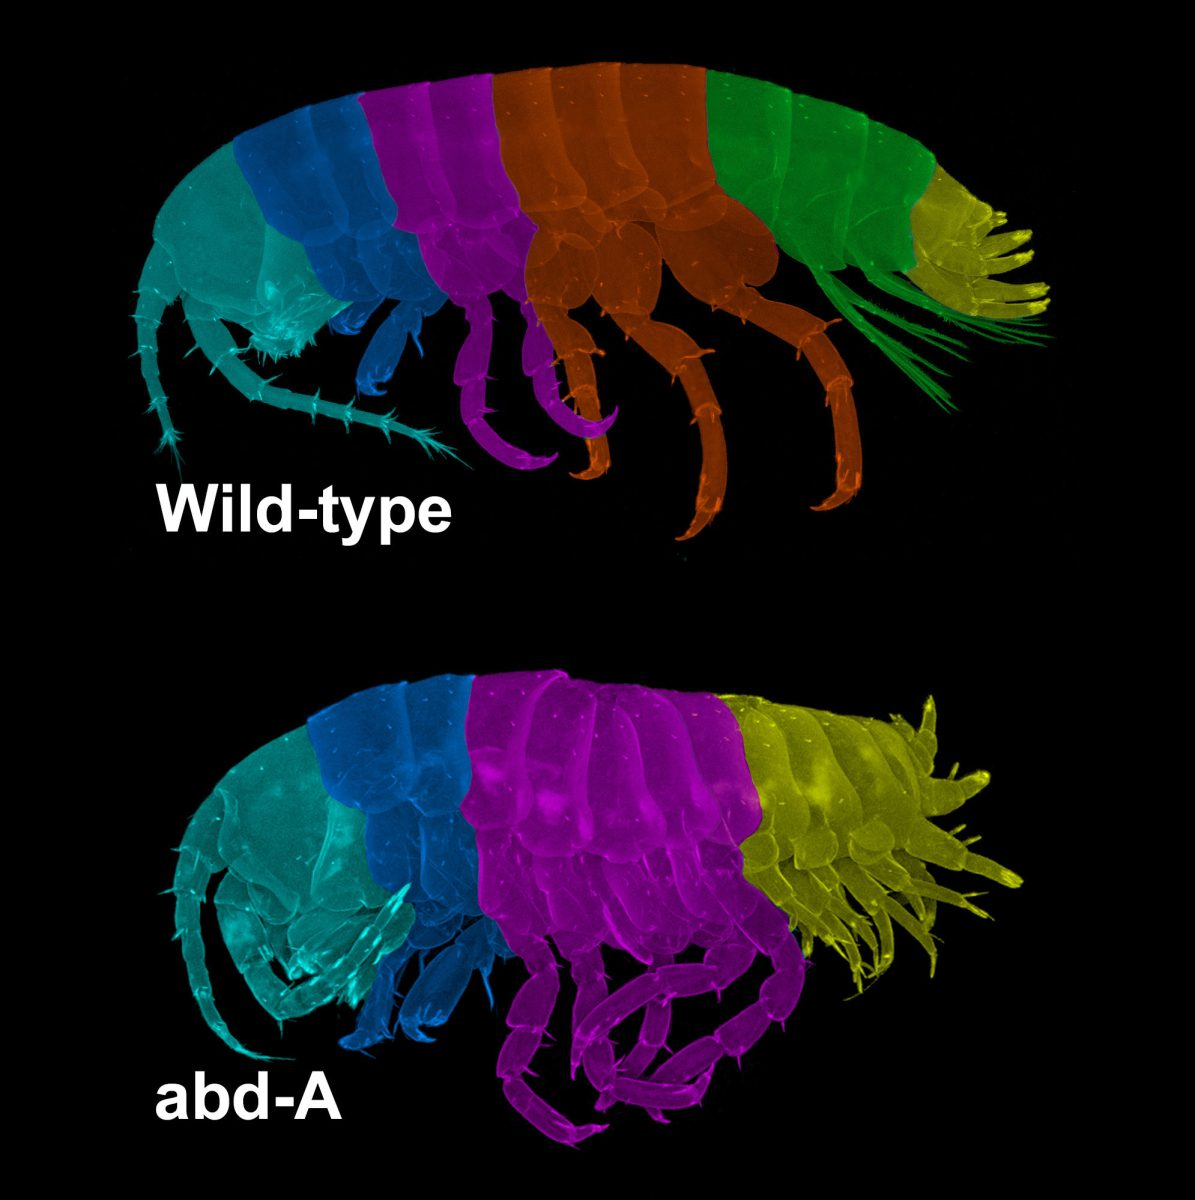 Segmentation in an Arthropod